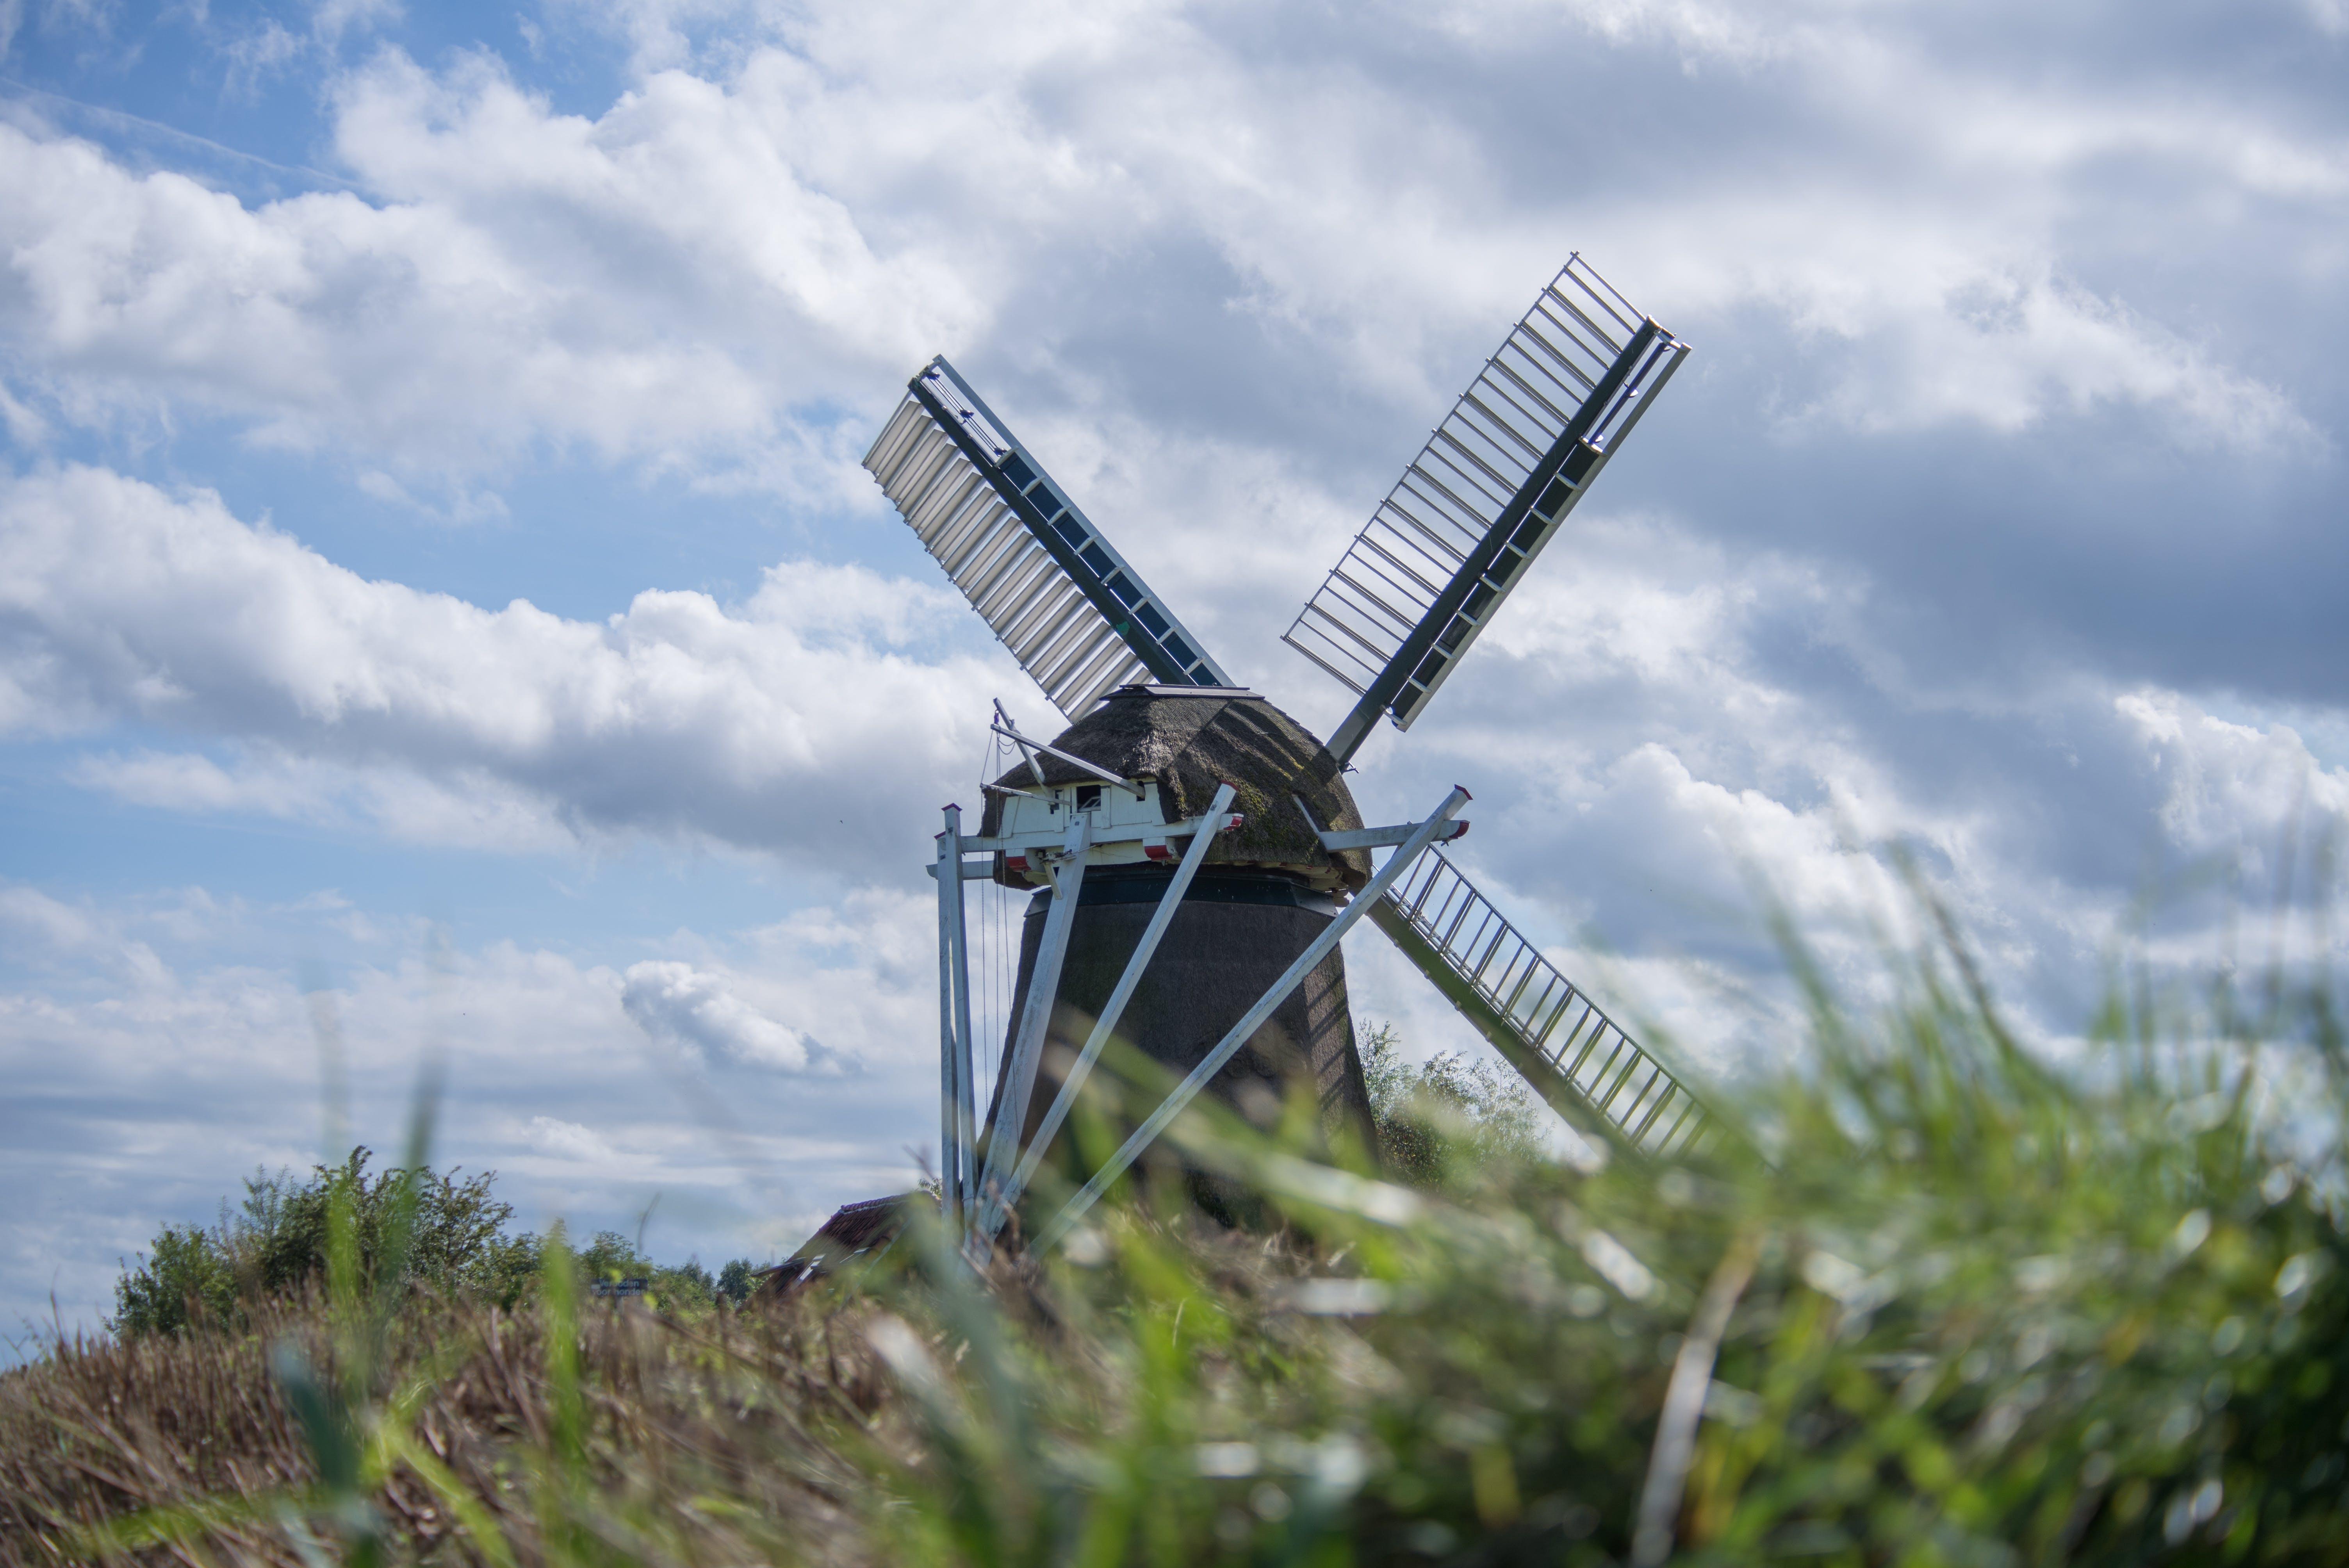 Green Grass Near Gray Windmill